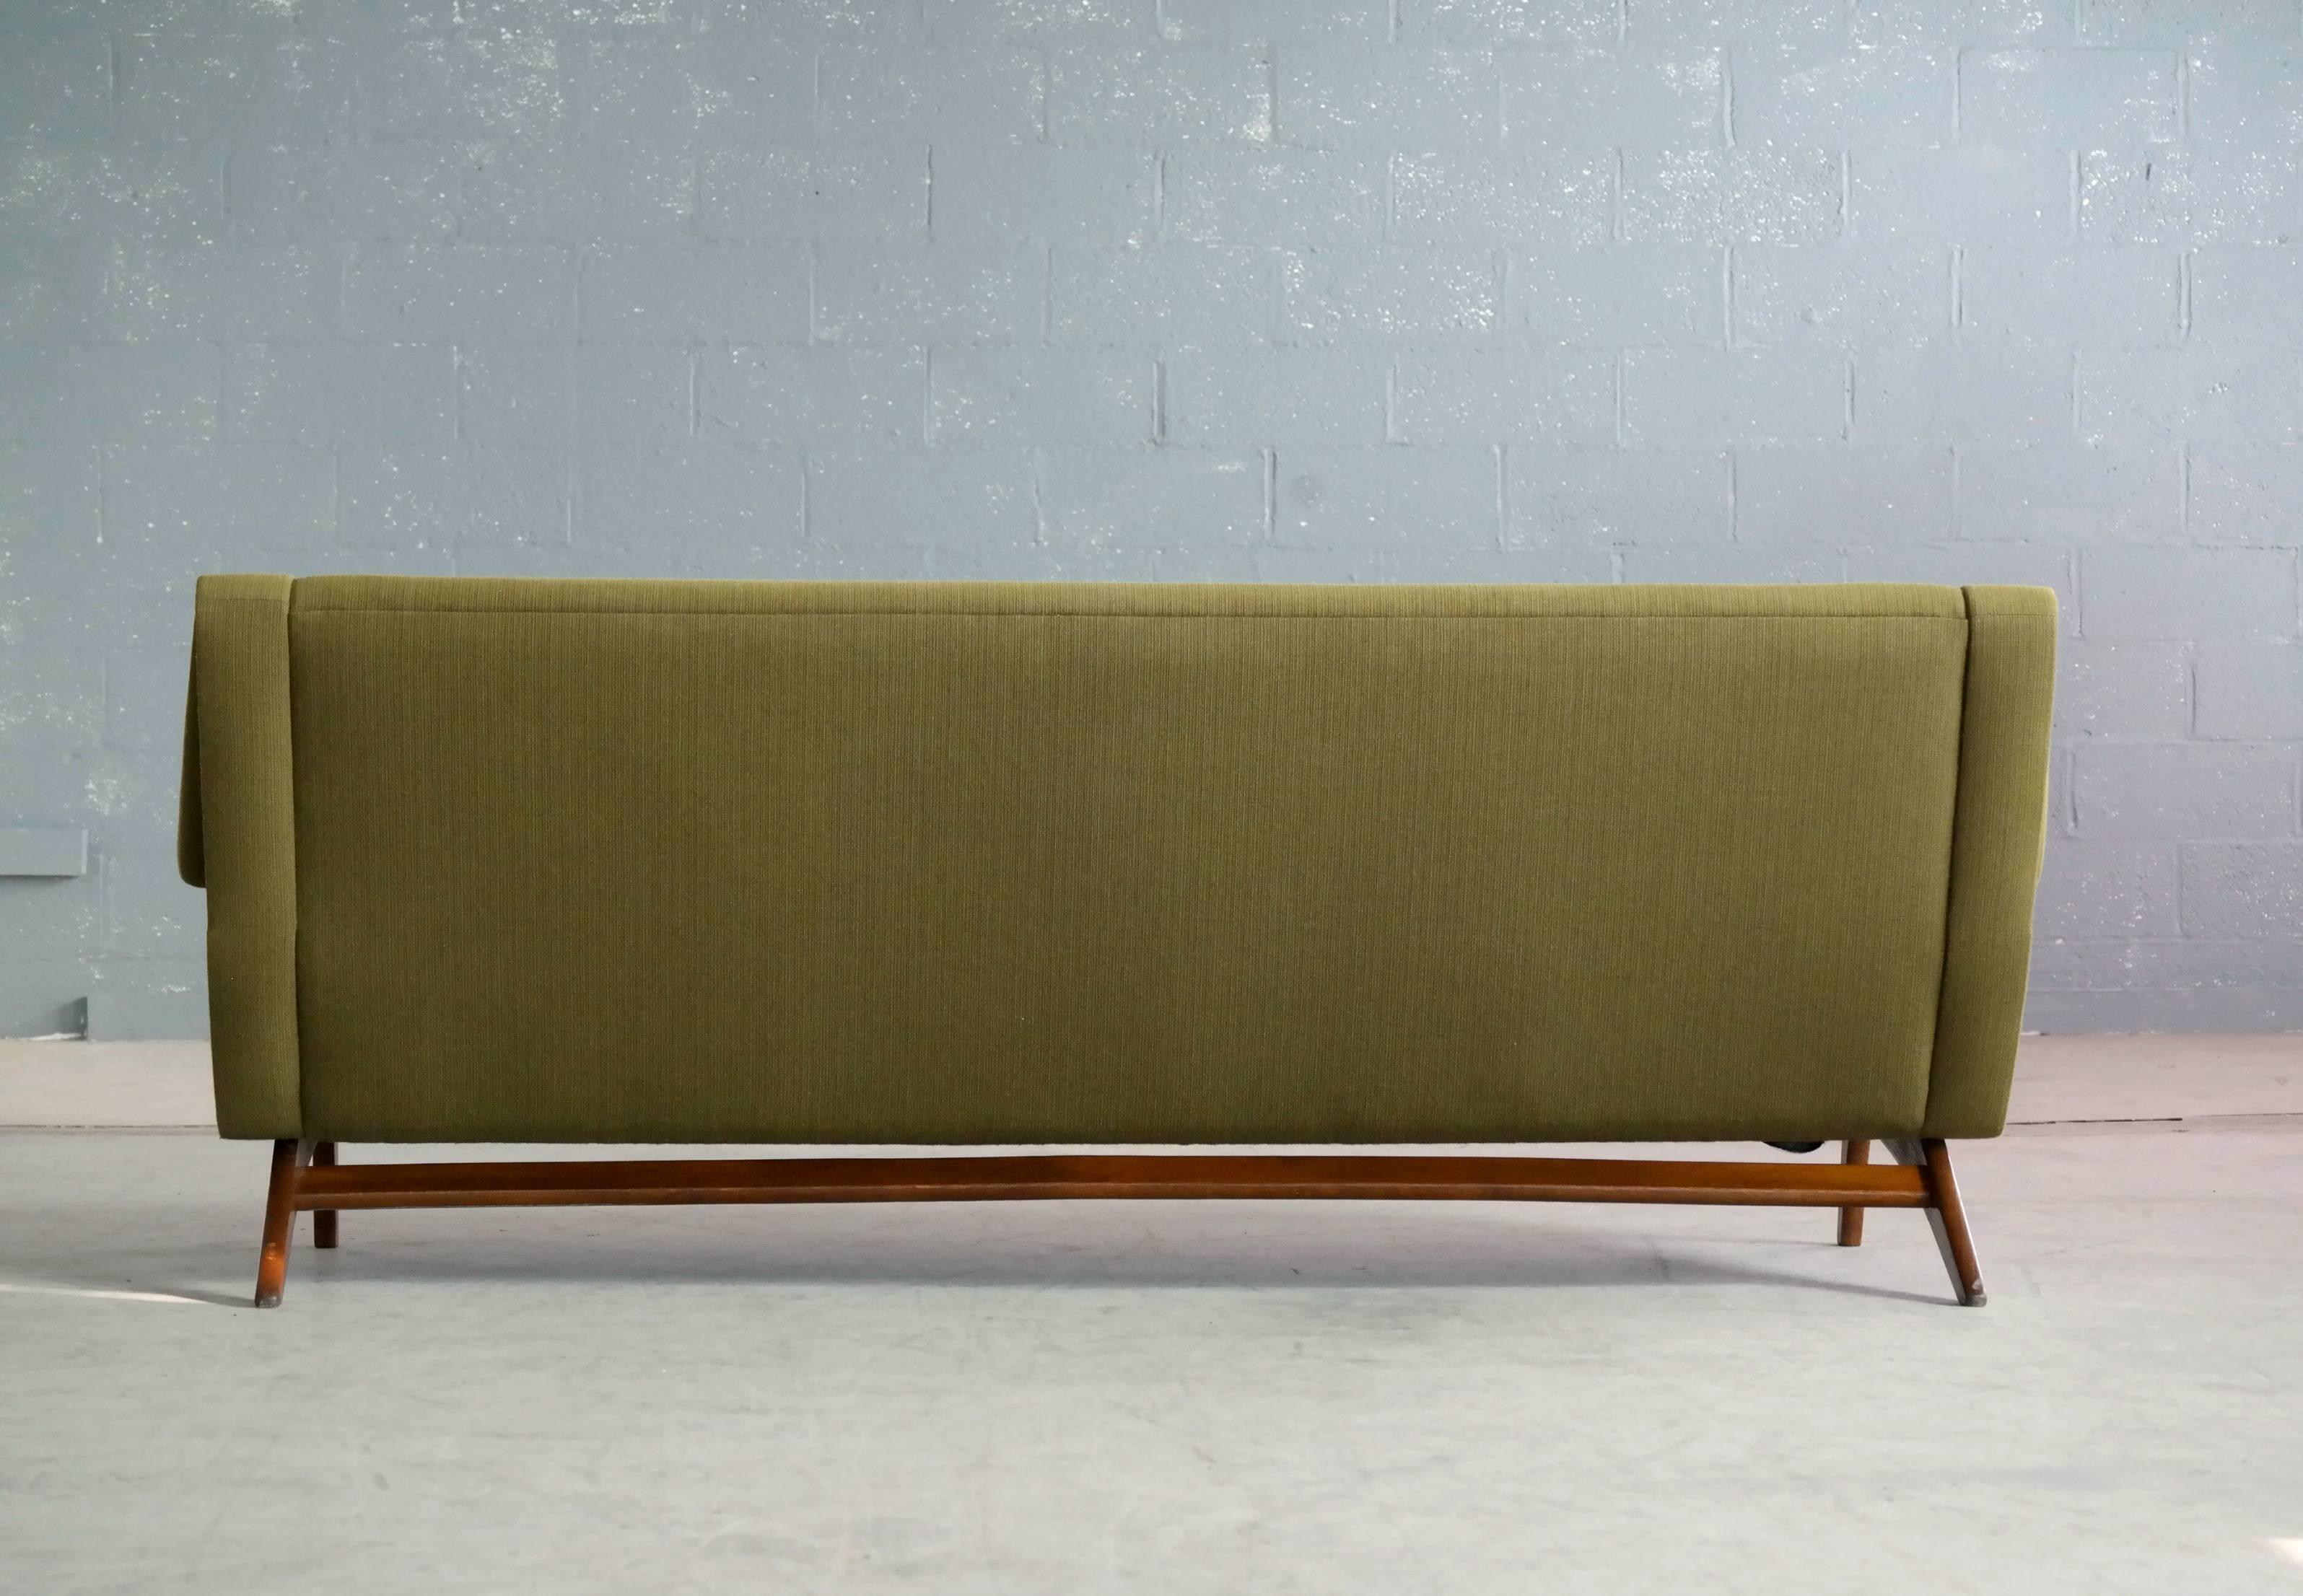 Captivating Danish Midcentury Sofa In Wool And Teak By Erhardsen And Erlandsen For Eran    Image 7